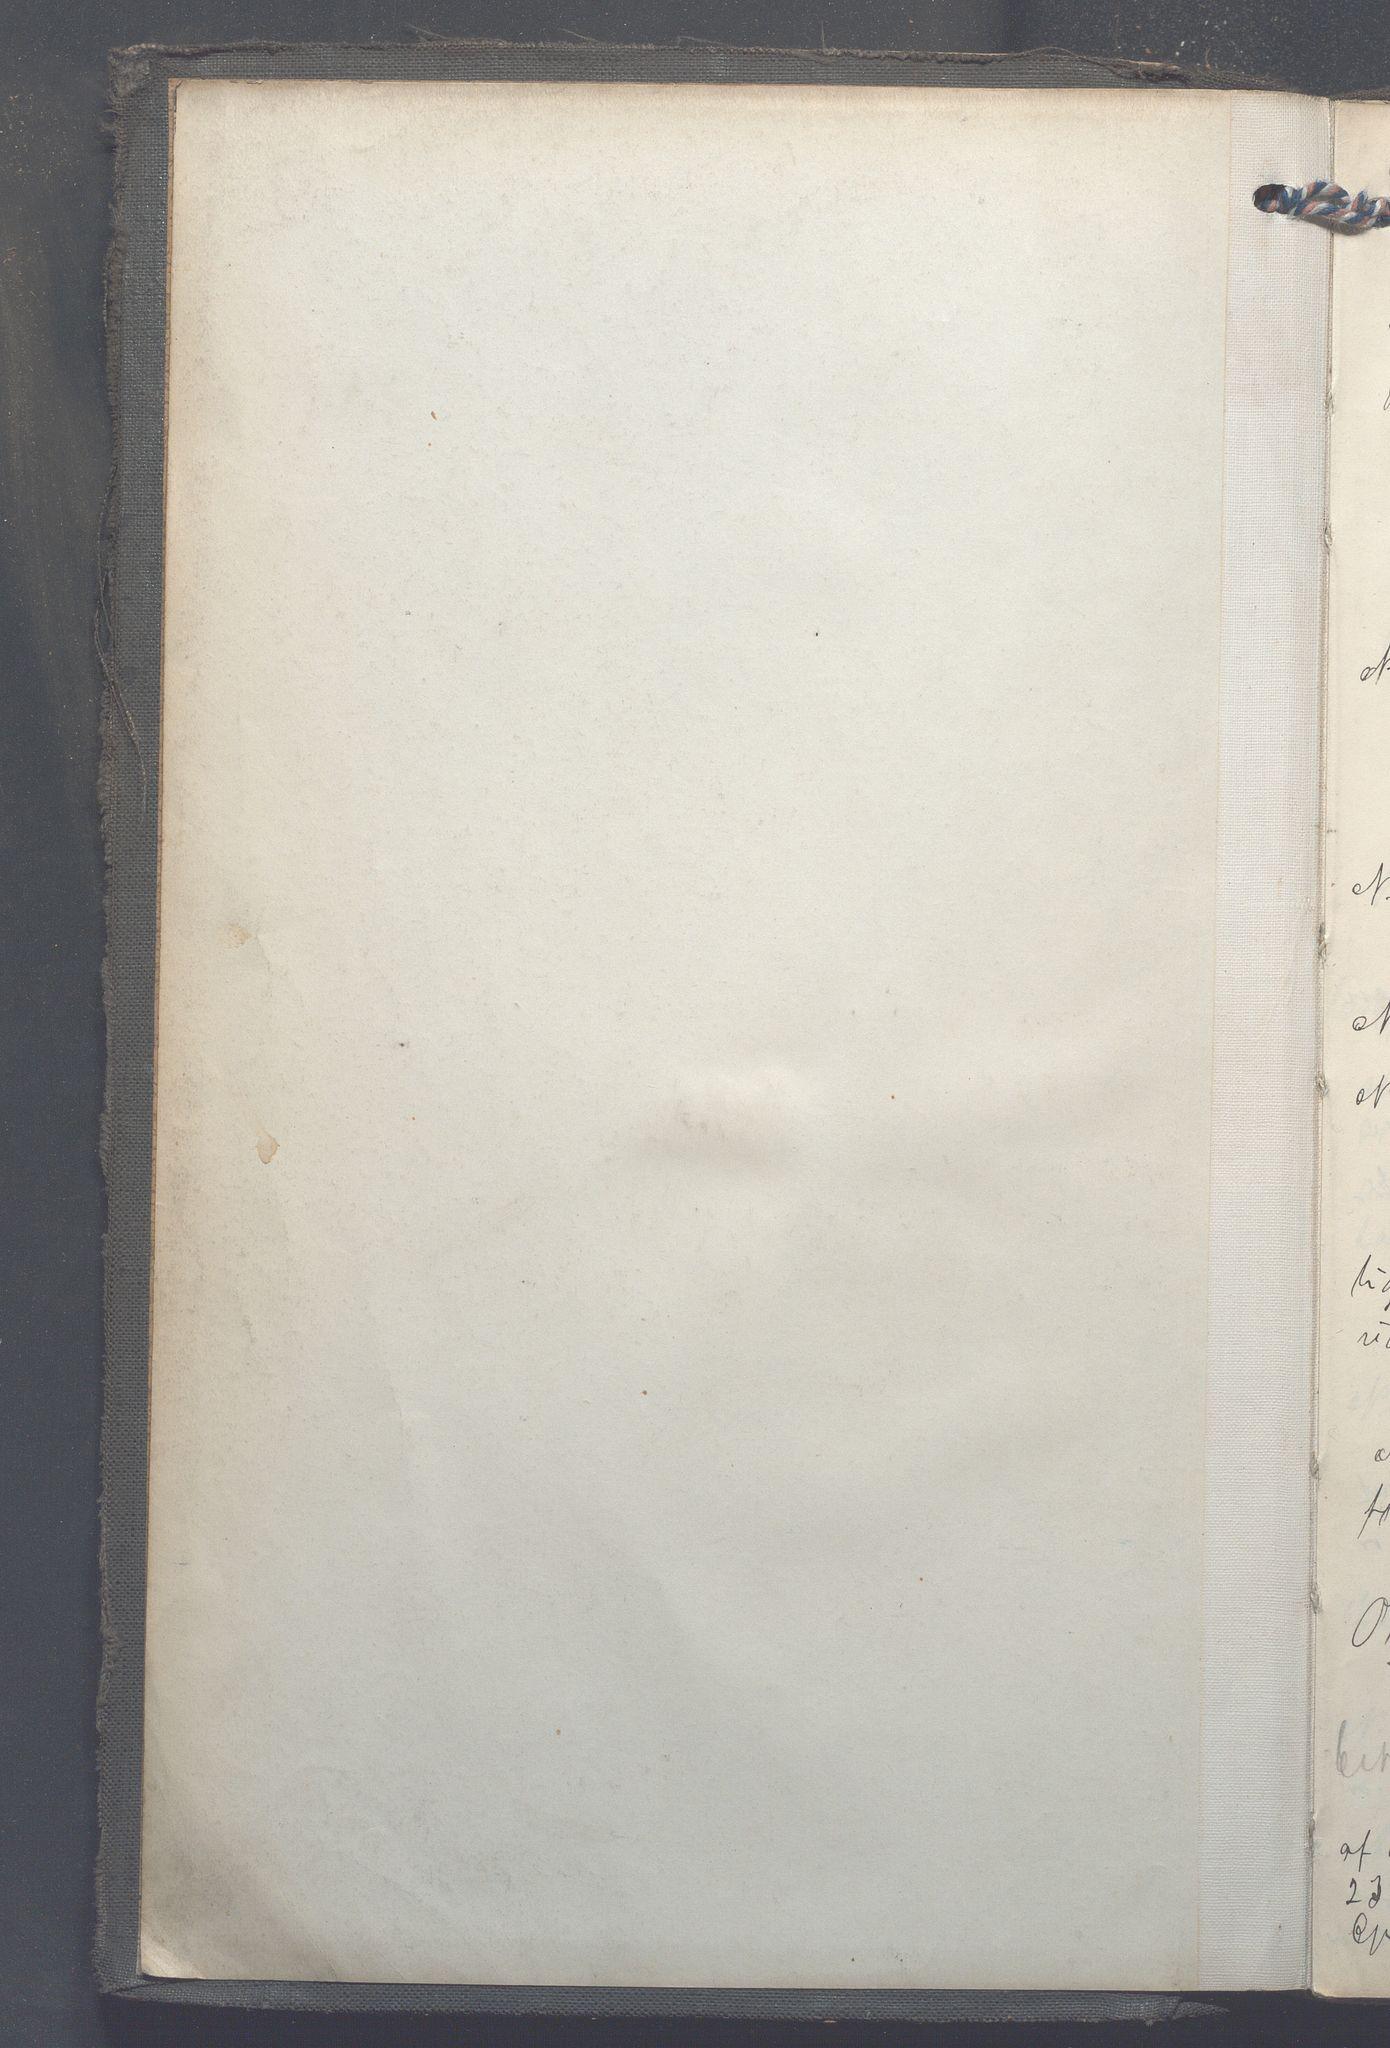 OBA, Lensmennene i Aker, F/Fa/L0012: Branntakstprotokoll, 1904-1910